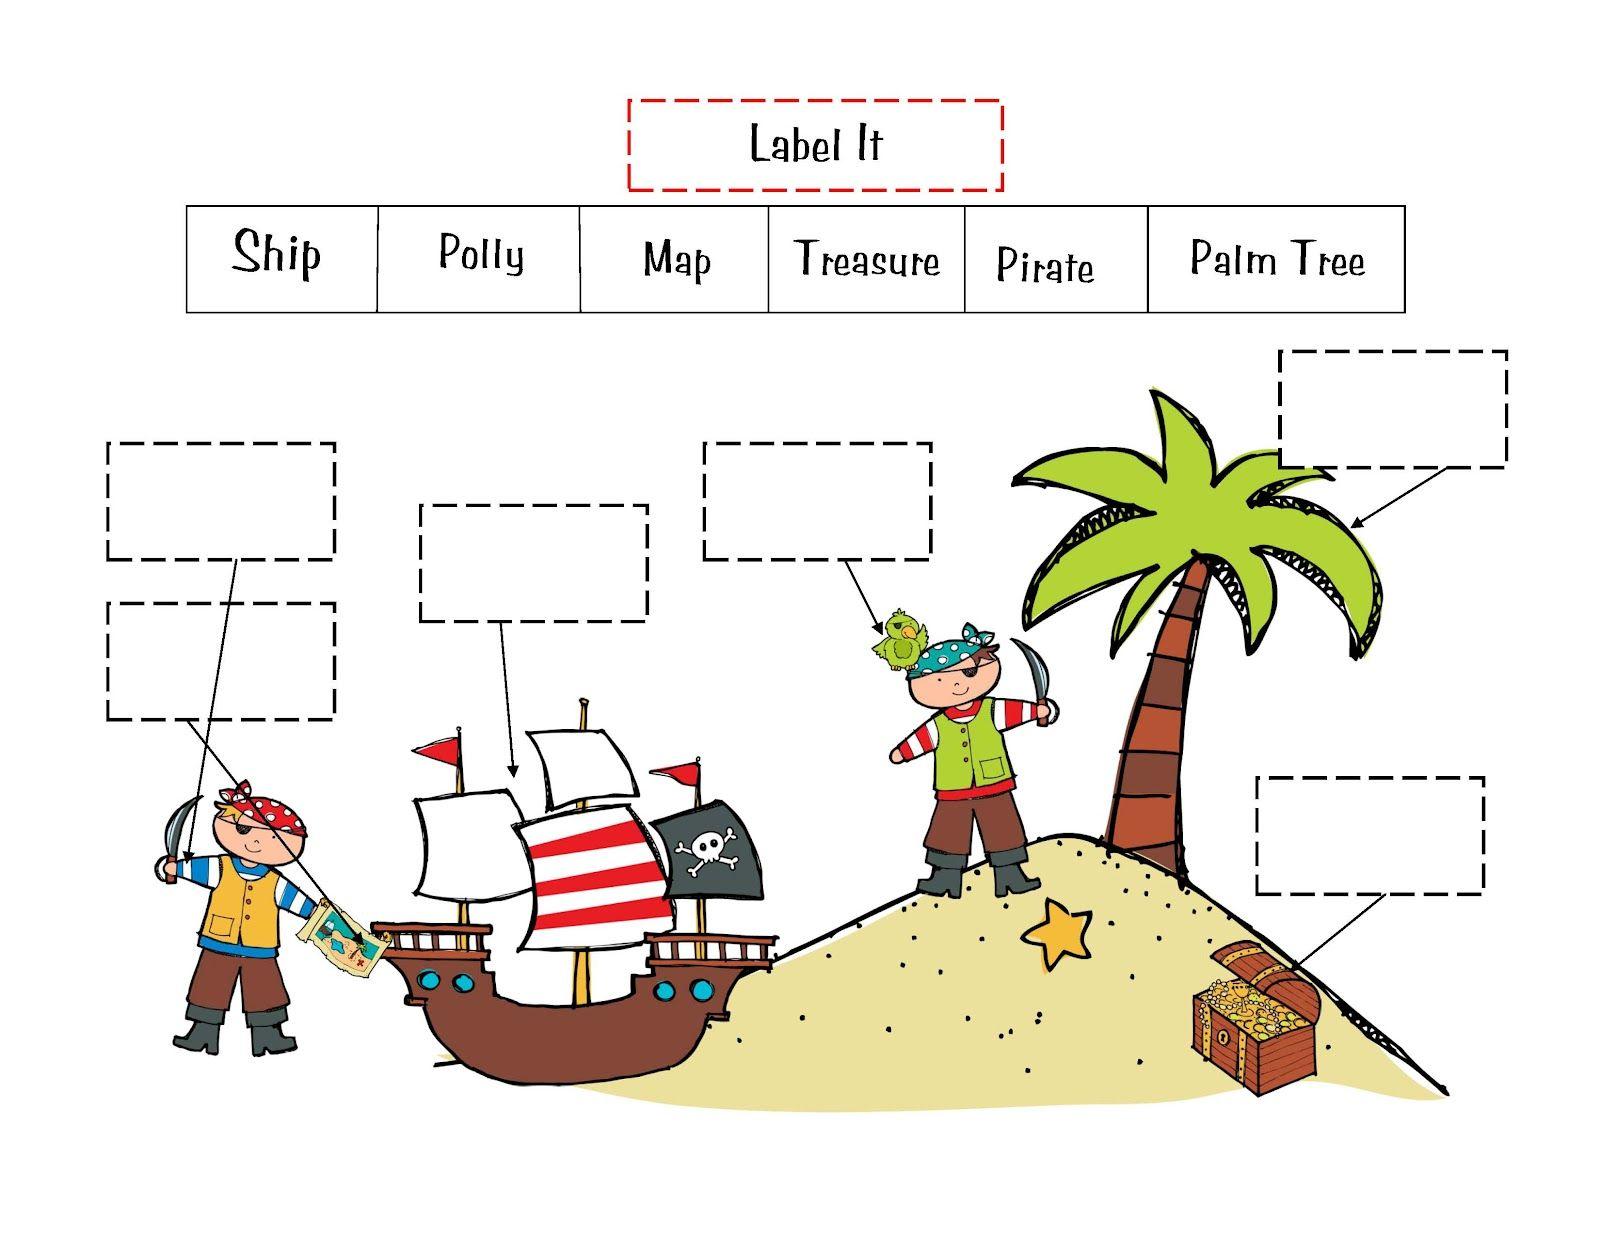 Pirate Theme For Preschool Preschool Printables Pirate Boy Printable Pirate Activities Pirate Preschool Pirates [ 1236 x 1600 Pixel ]